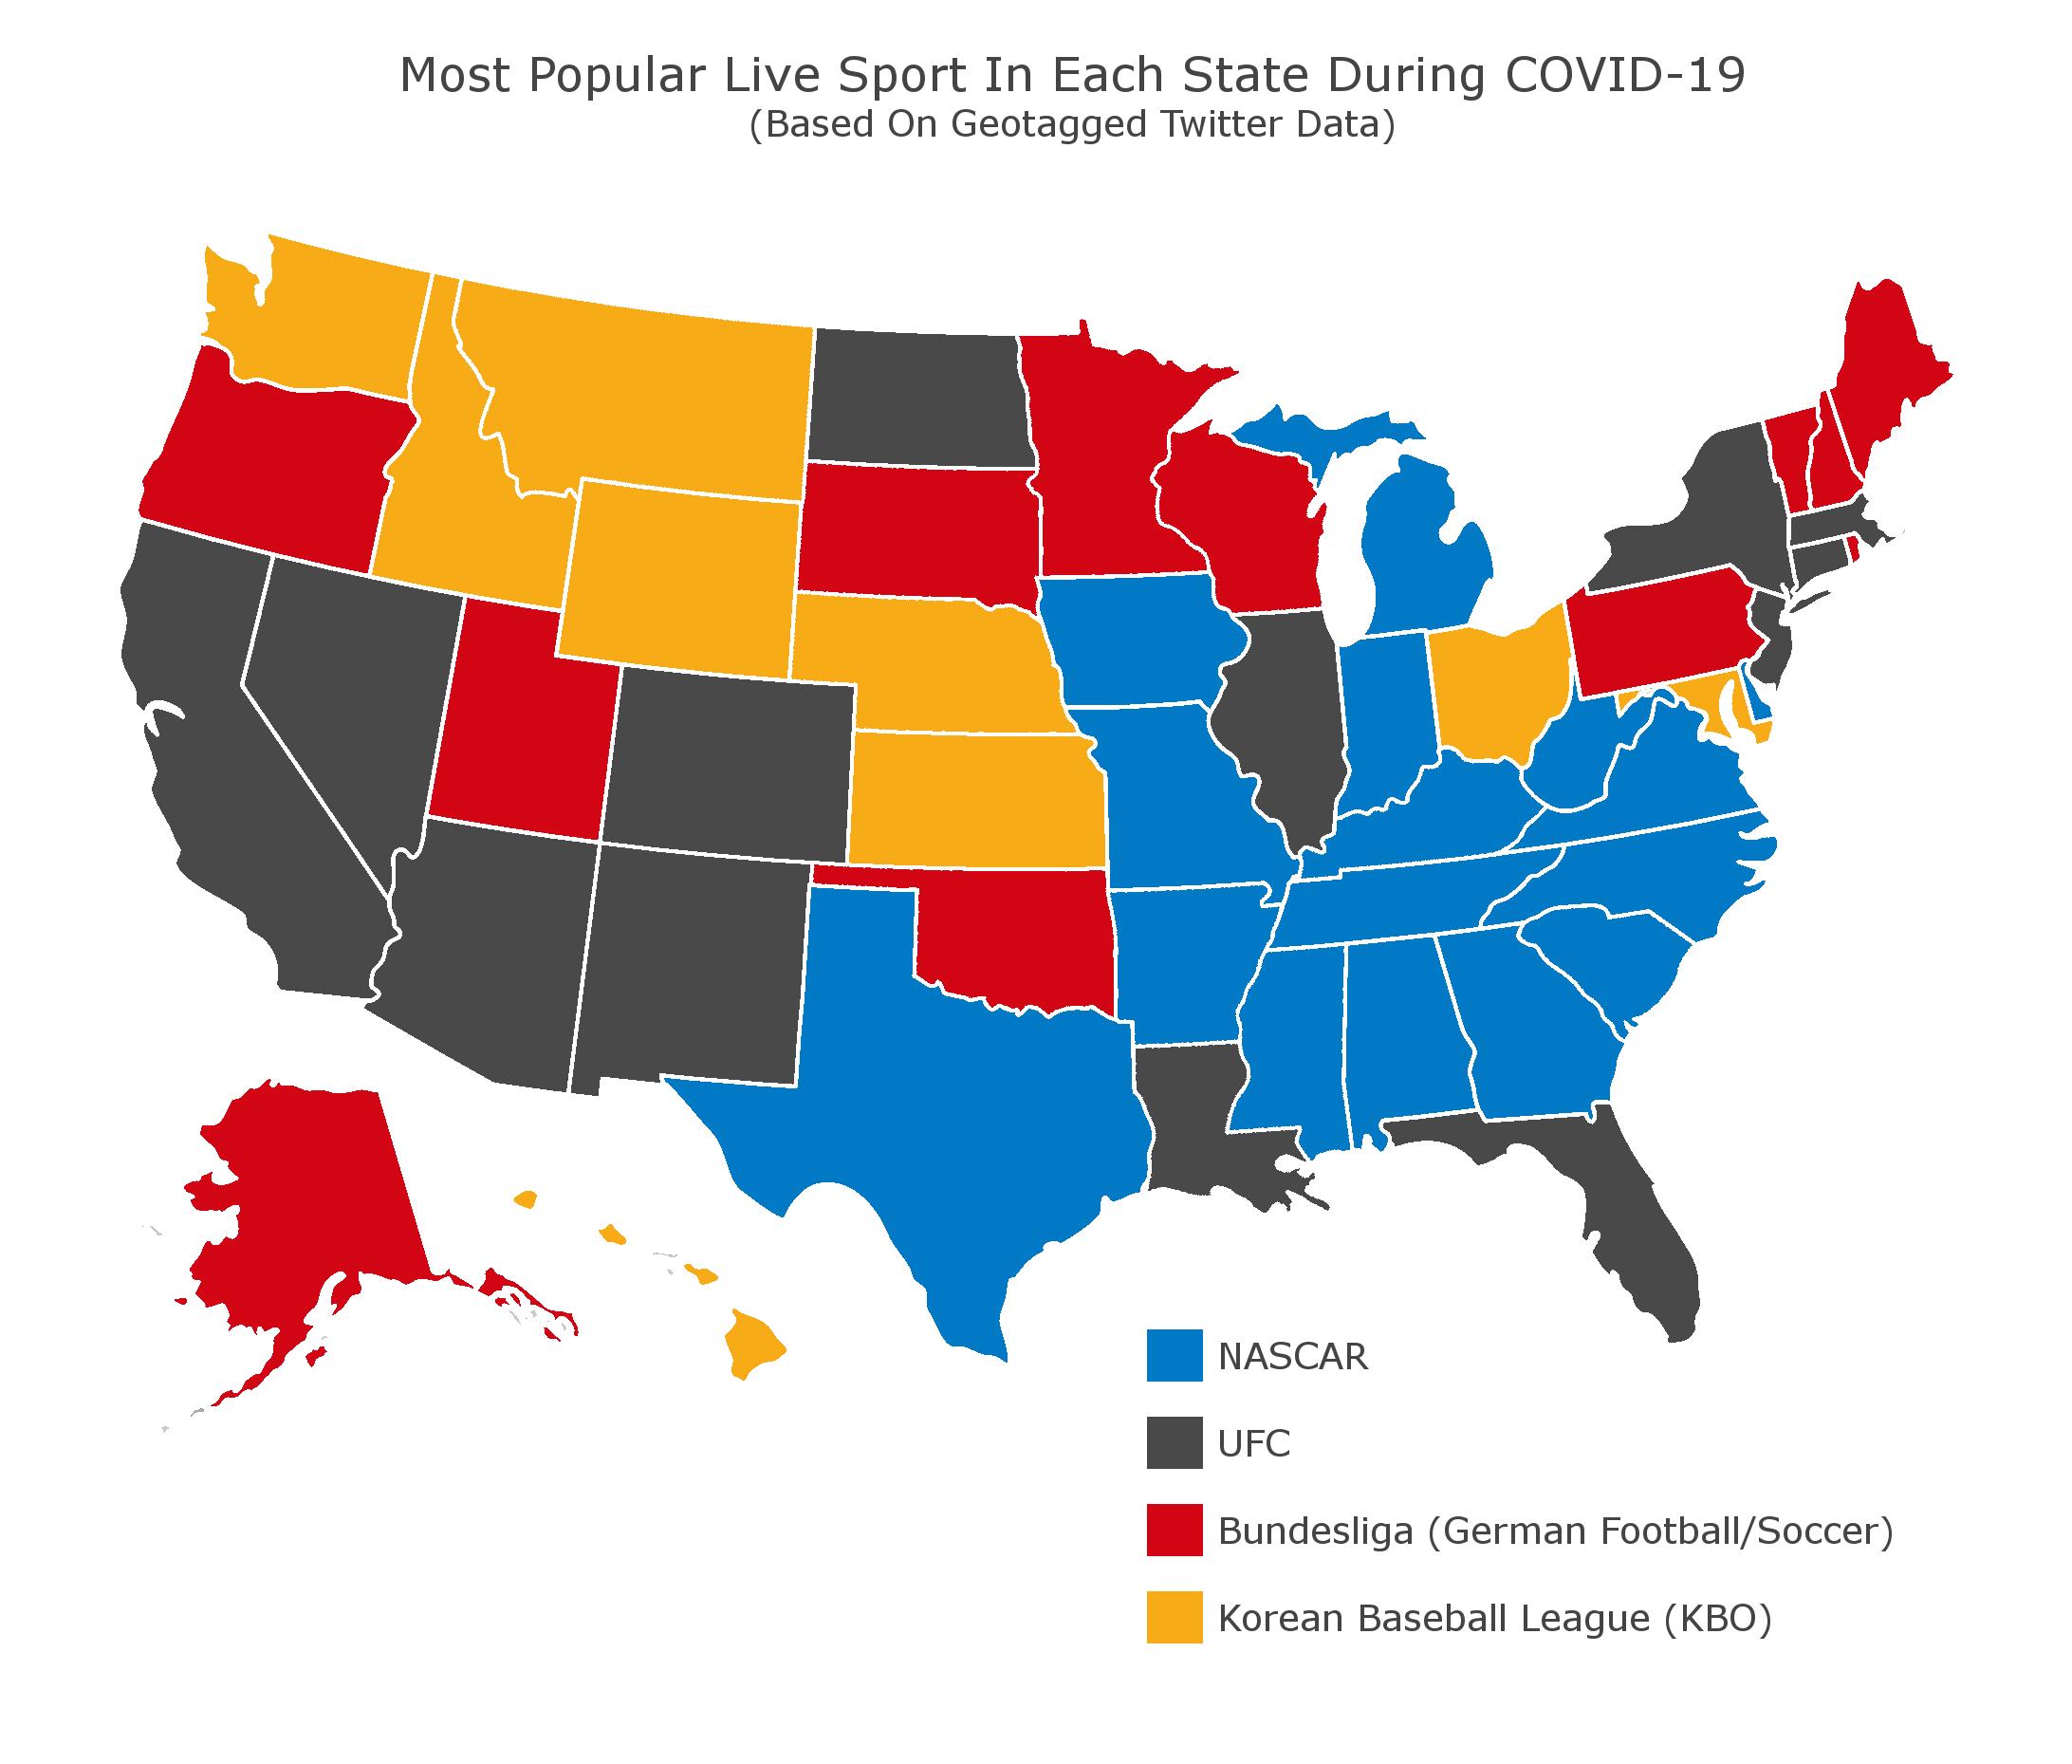 Live Sports TV Viewerships (Credit: BetOnline.ag)